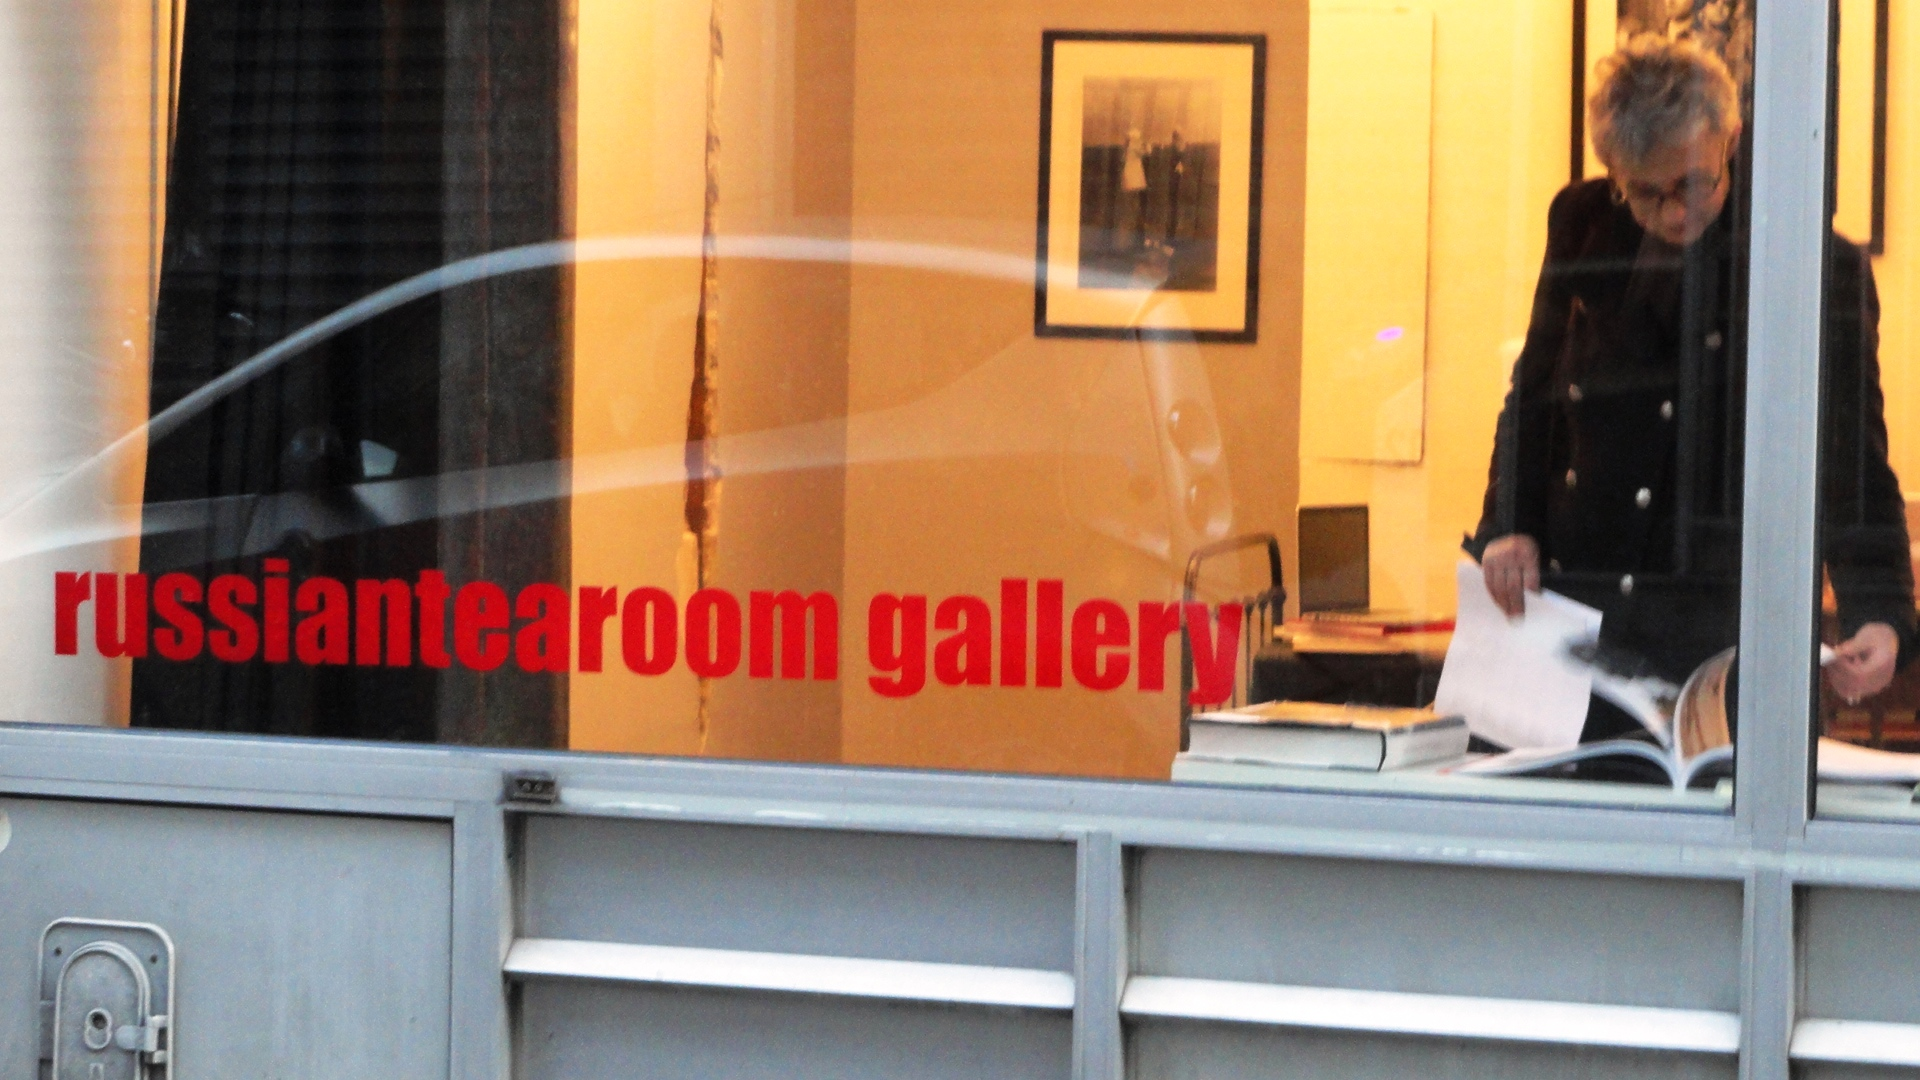 Russiantearoom gallery